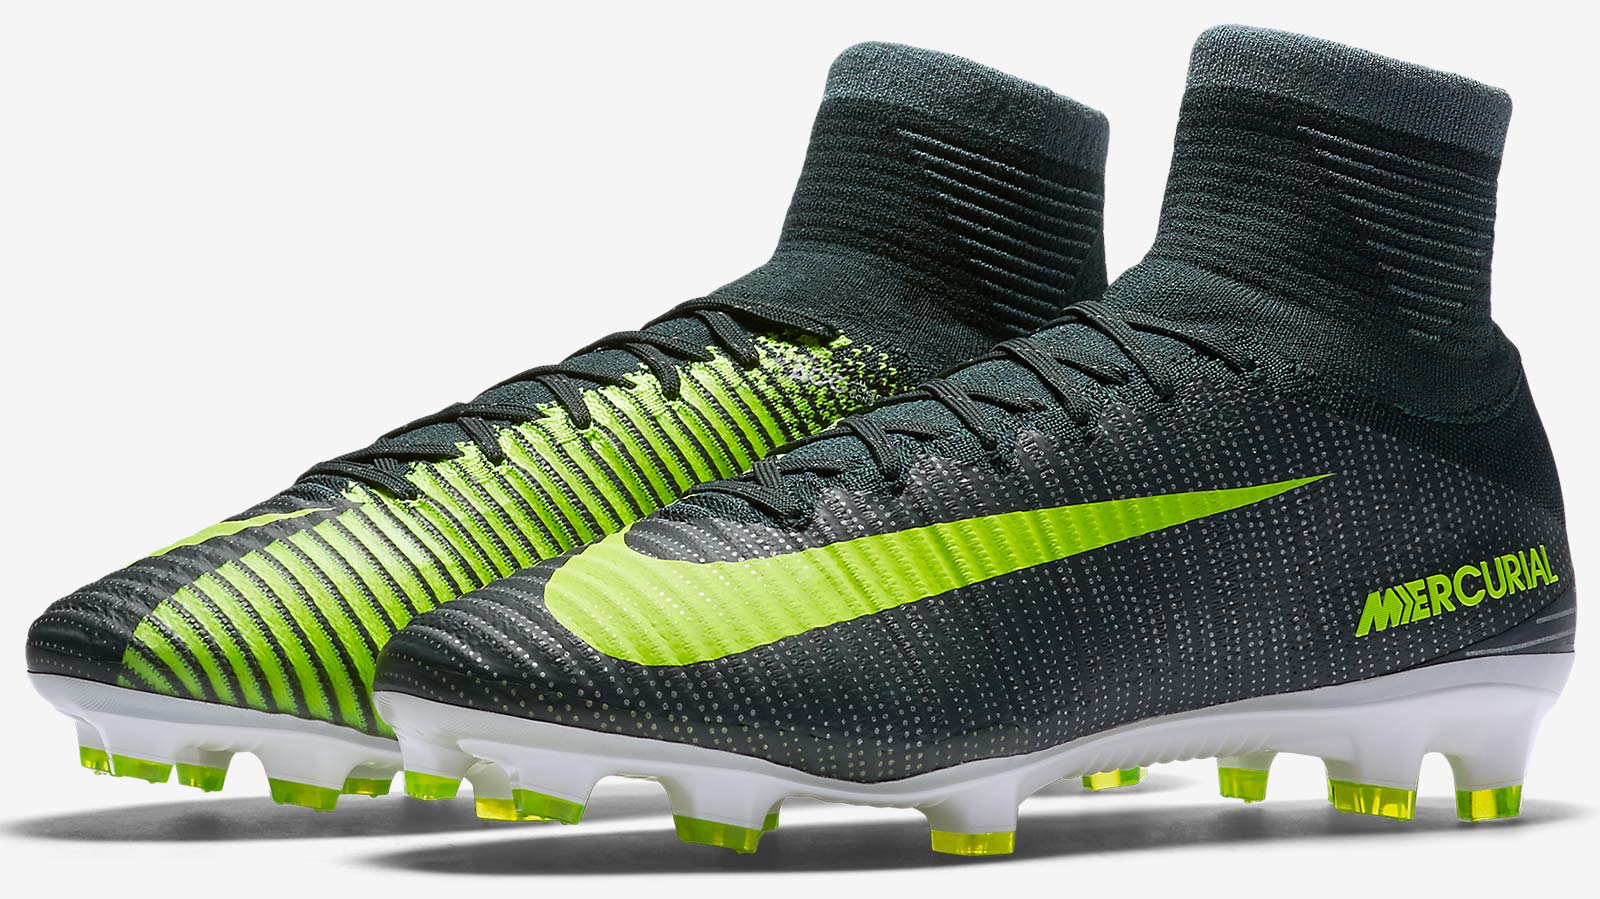 newest 72c48 46e87 Así son las nuevas botas Nike Mercurial Superfly 5 CR7 Chapter 3